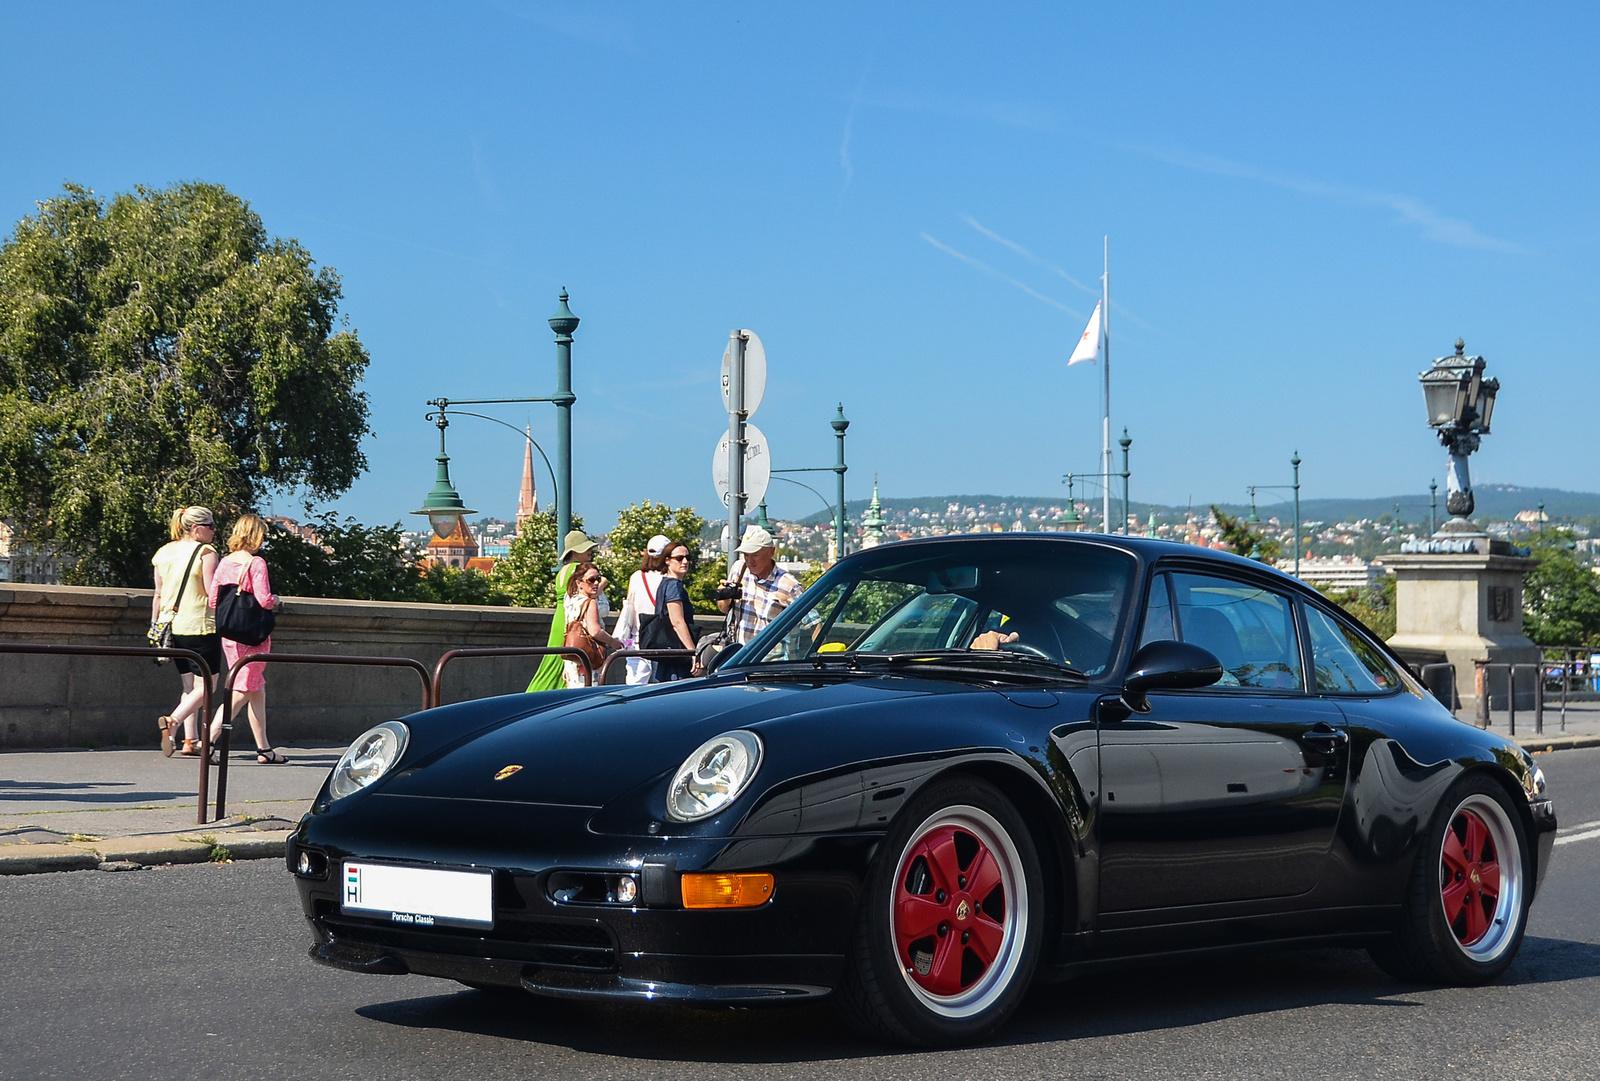 Porsche 911 Carrera S (993)